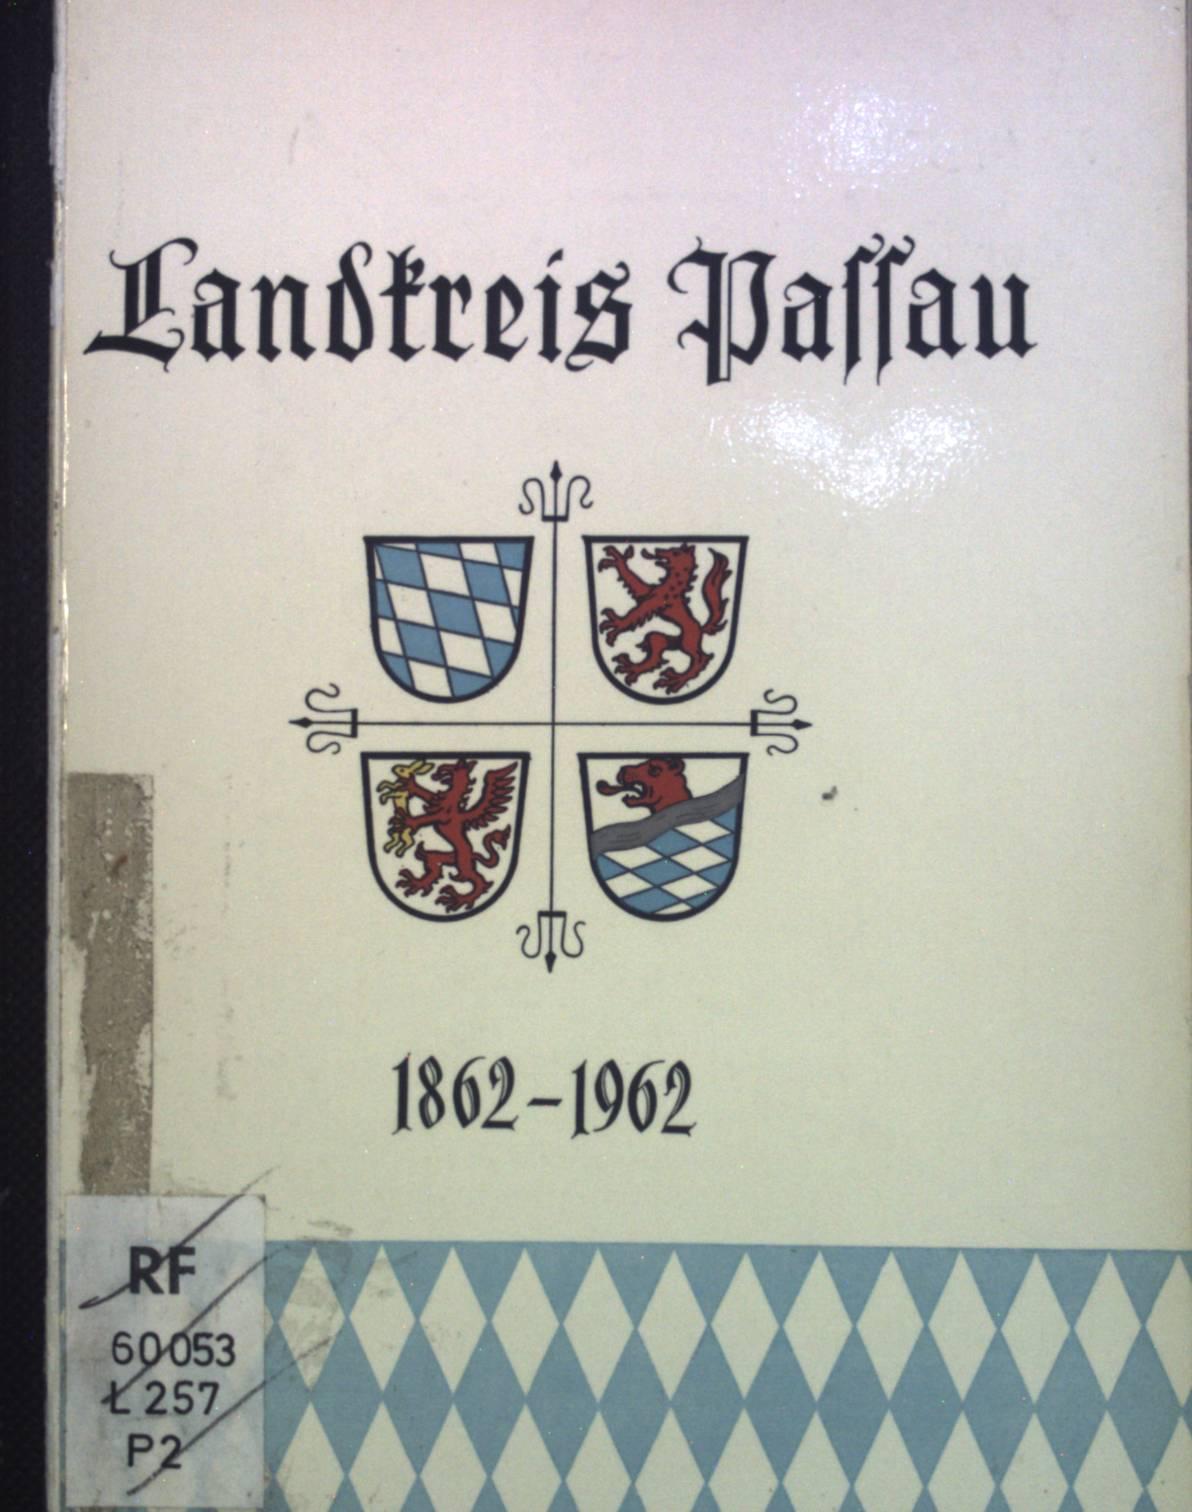 Landkreis Passau 1862-1962: 100 Jahre Landkreis Passau.: Karl, Hans: